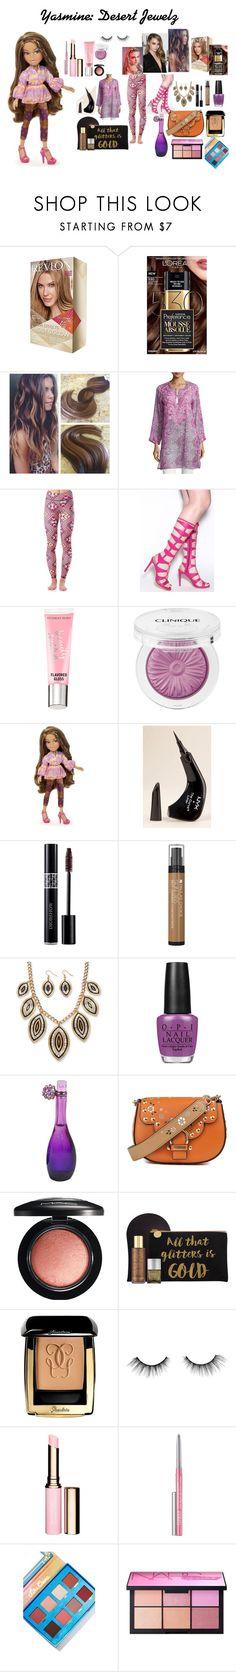 """Yasmin (Desert Jewelz)"" by mimi-world on Polyvore featuring L'Oréal Paris, RAJ, Beauty Rush, Clinique, NYX, Paula's Choice, OPI, Jennifer Lopez, Marc Jacobs and MAC Cosmetics"